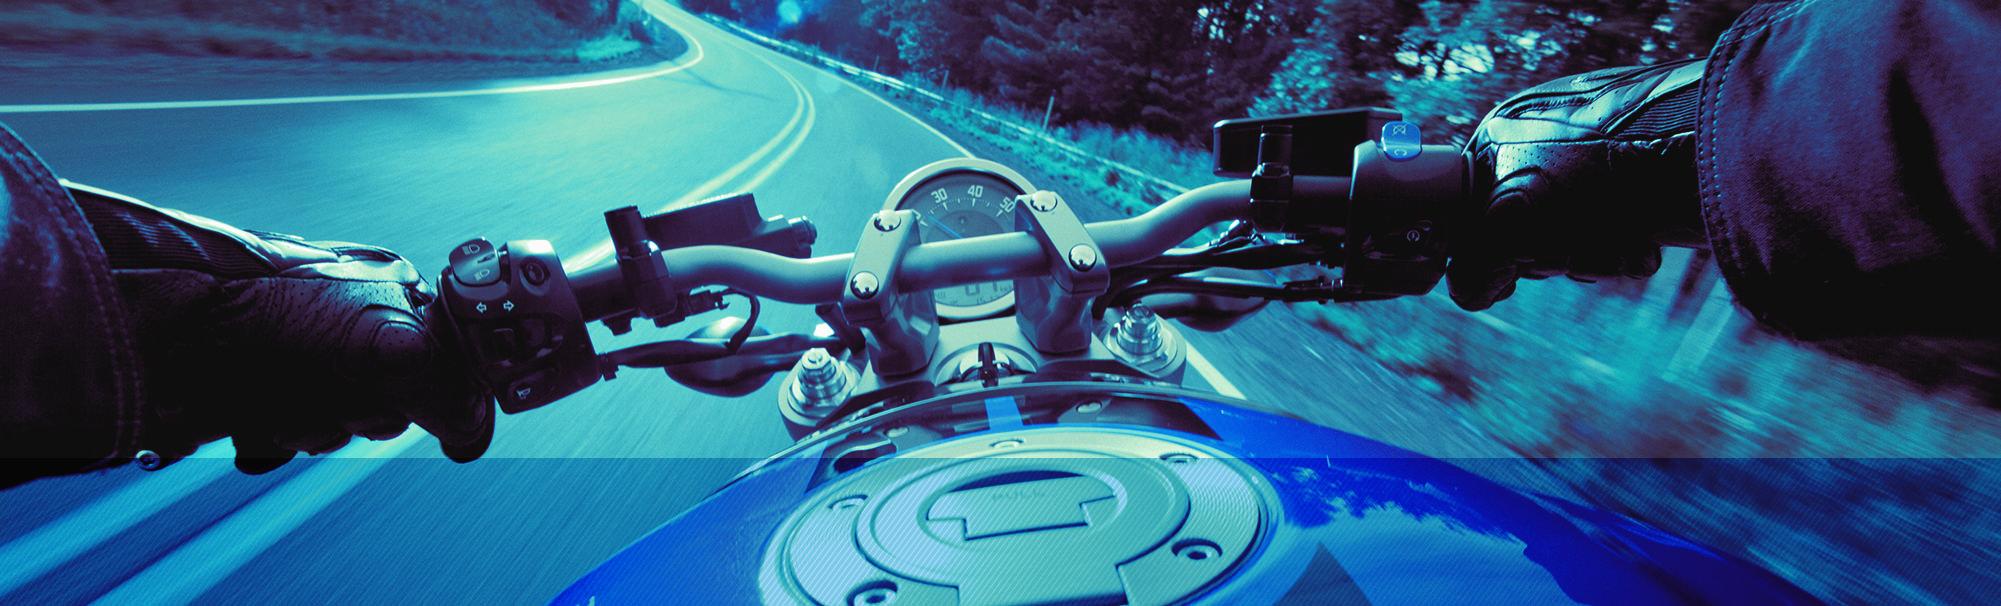 JMR-sliders-motorbike